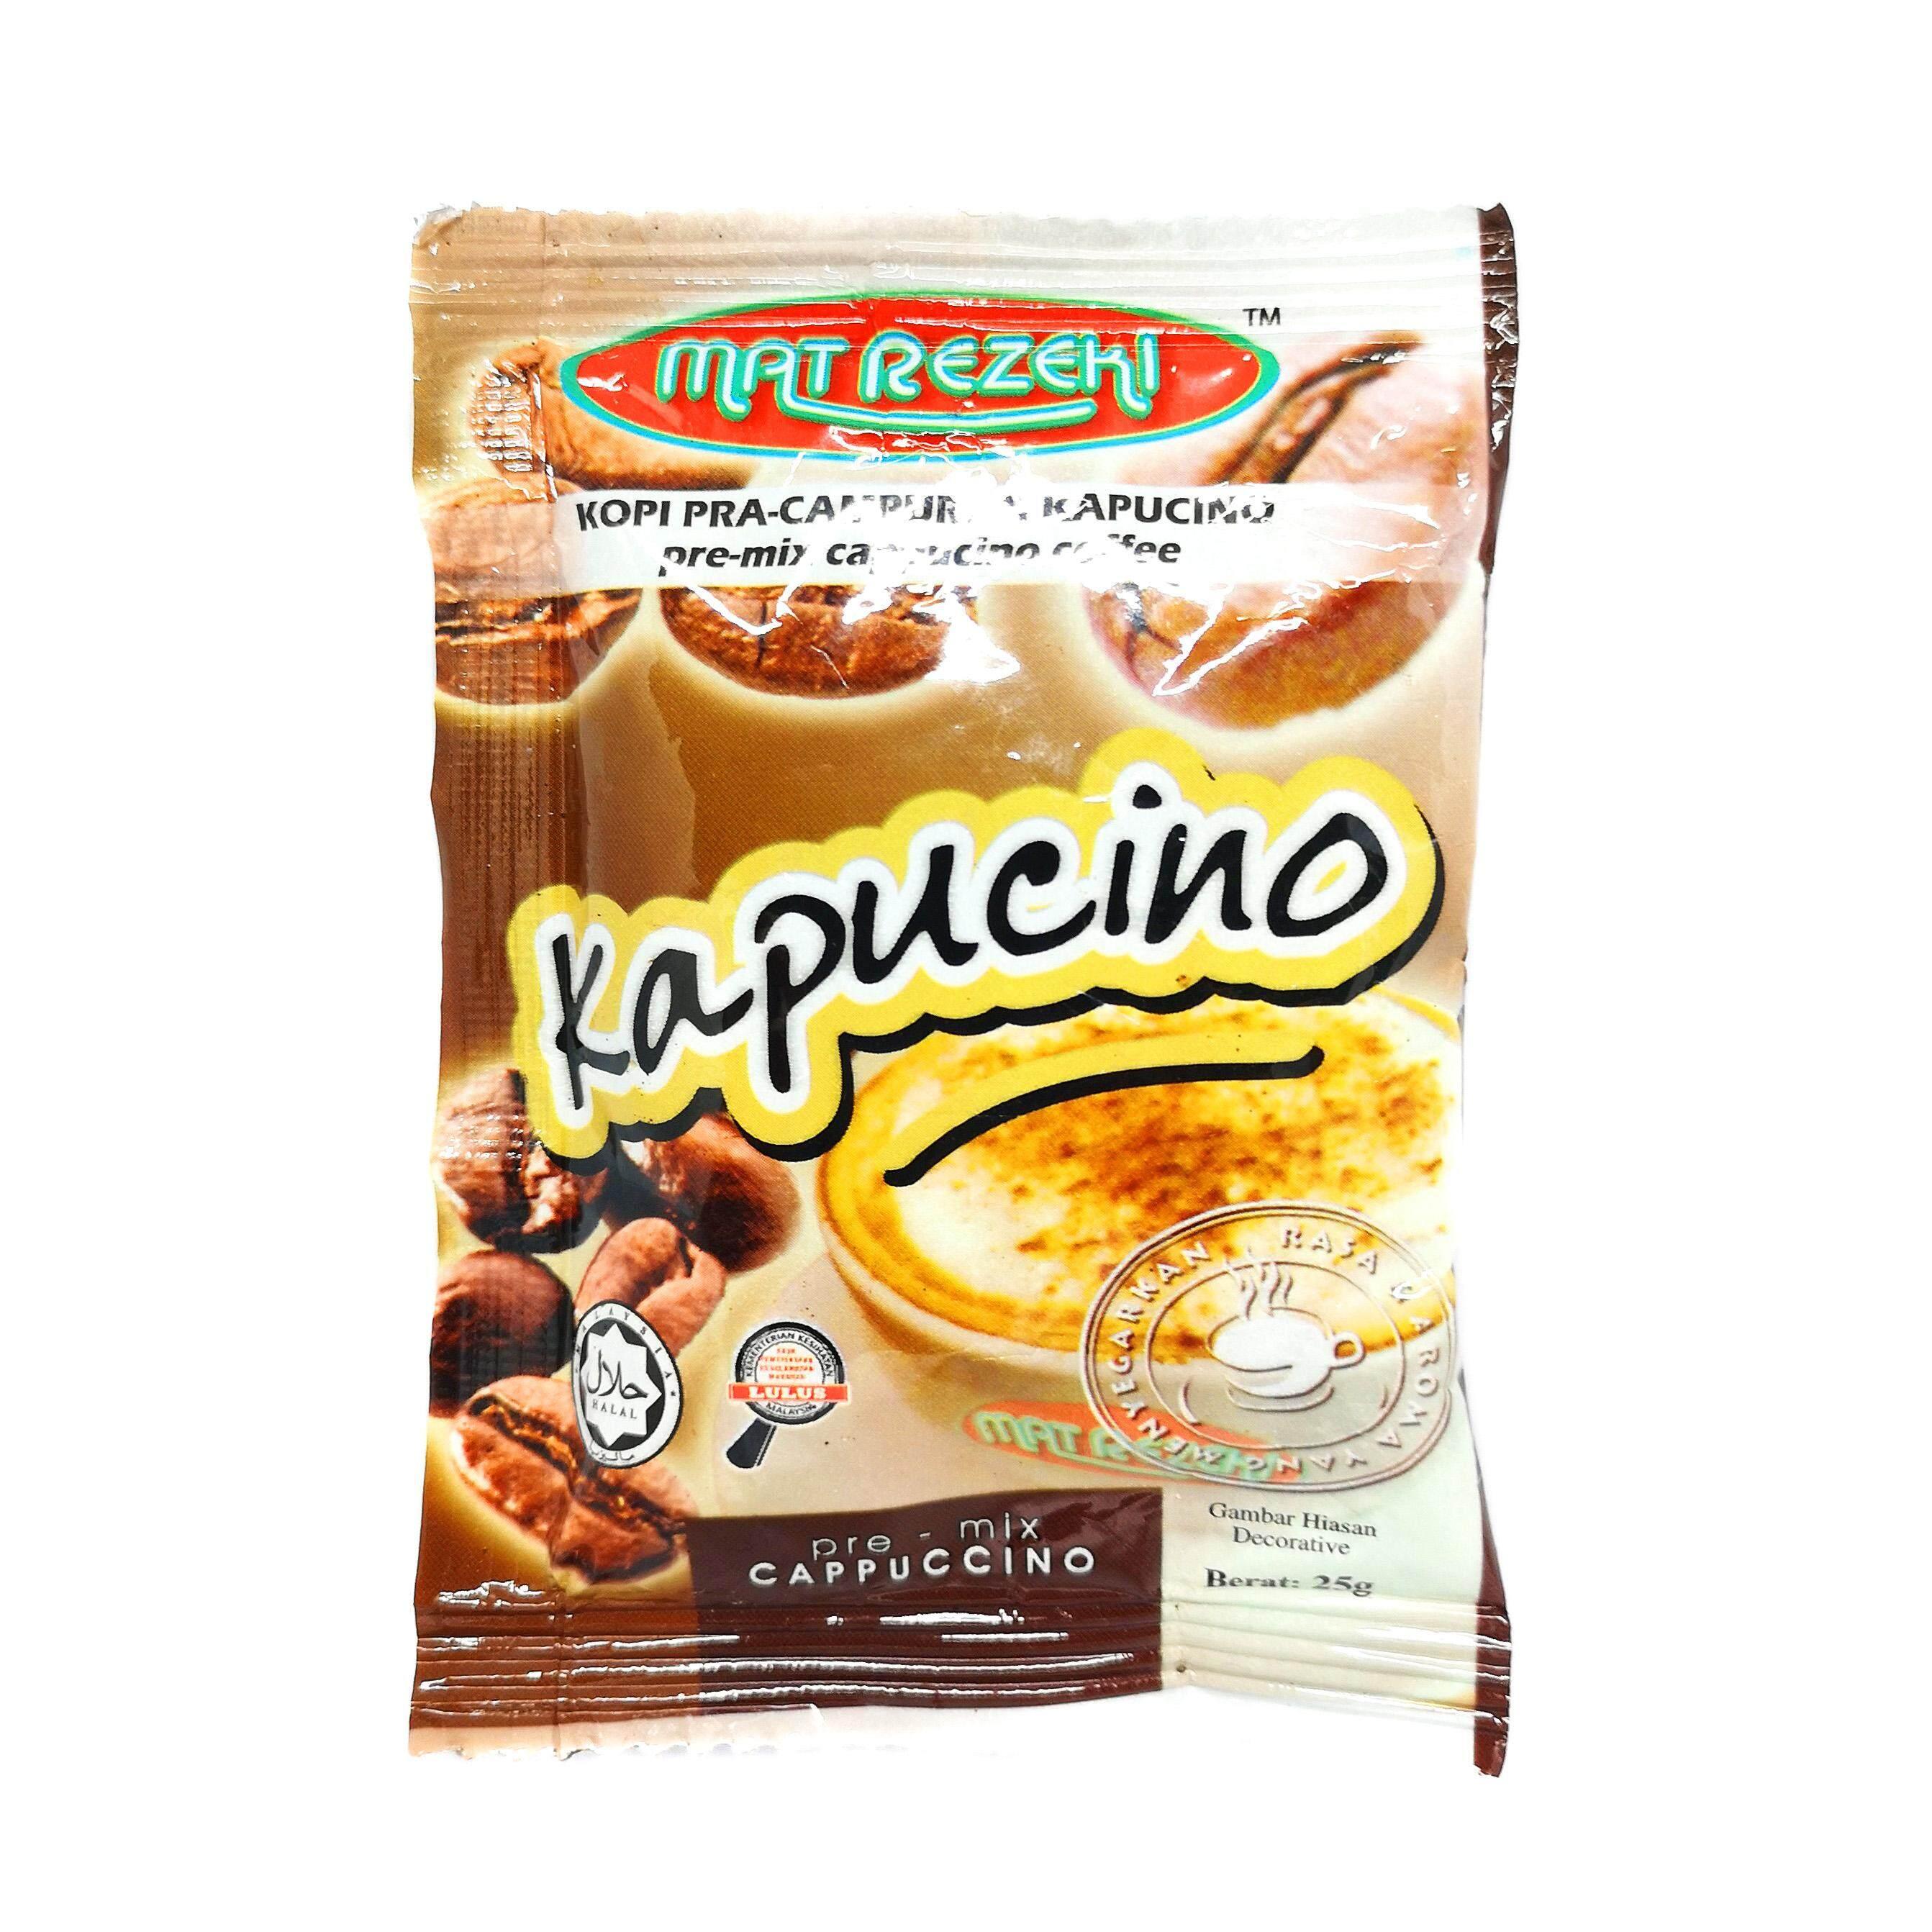 Kopi Pra-Campuran Kapucino Premix Cappucino Coffee